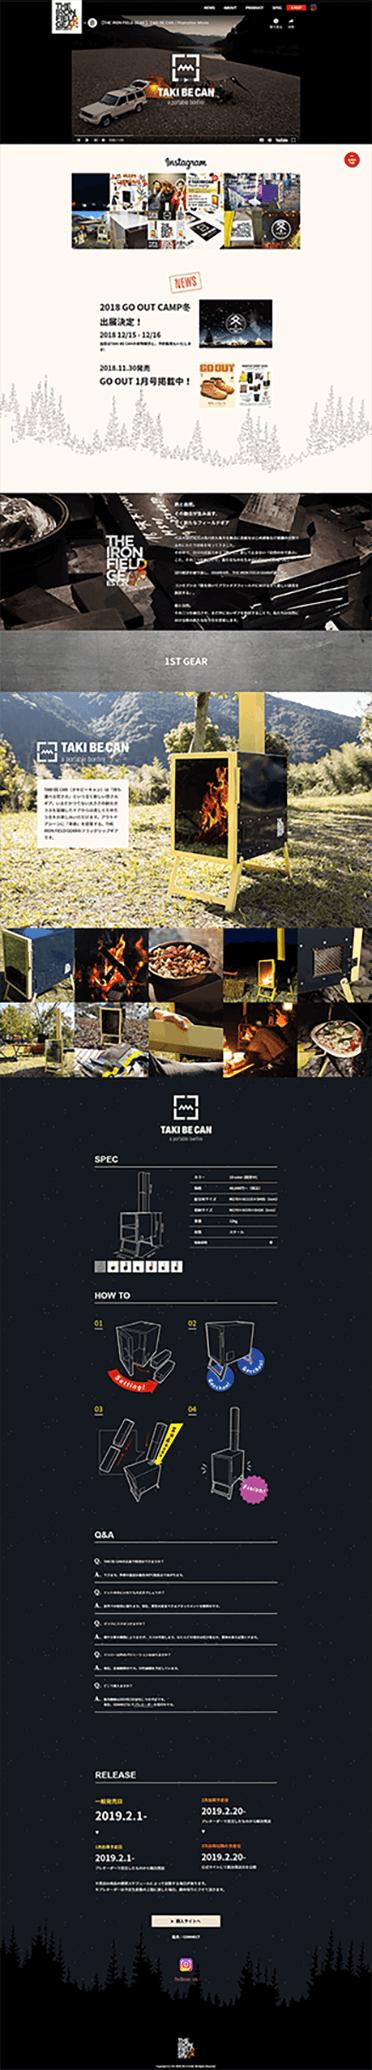 THE IRON FIELD GEAR  / THE IRON FIELD GEAR / ブランドサイト